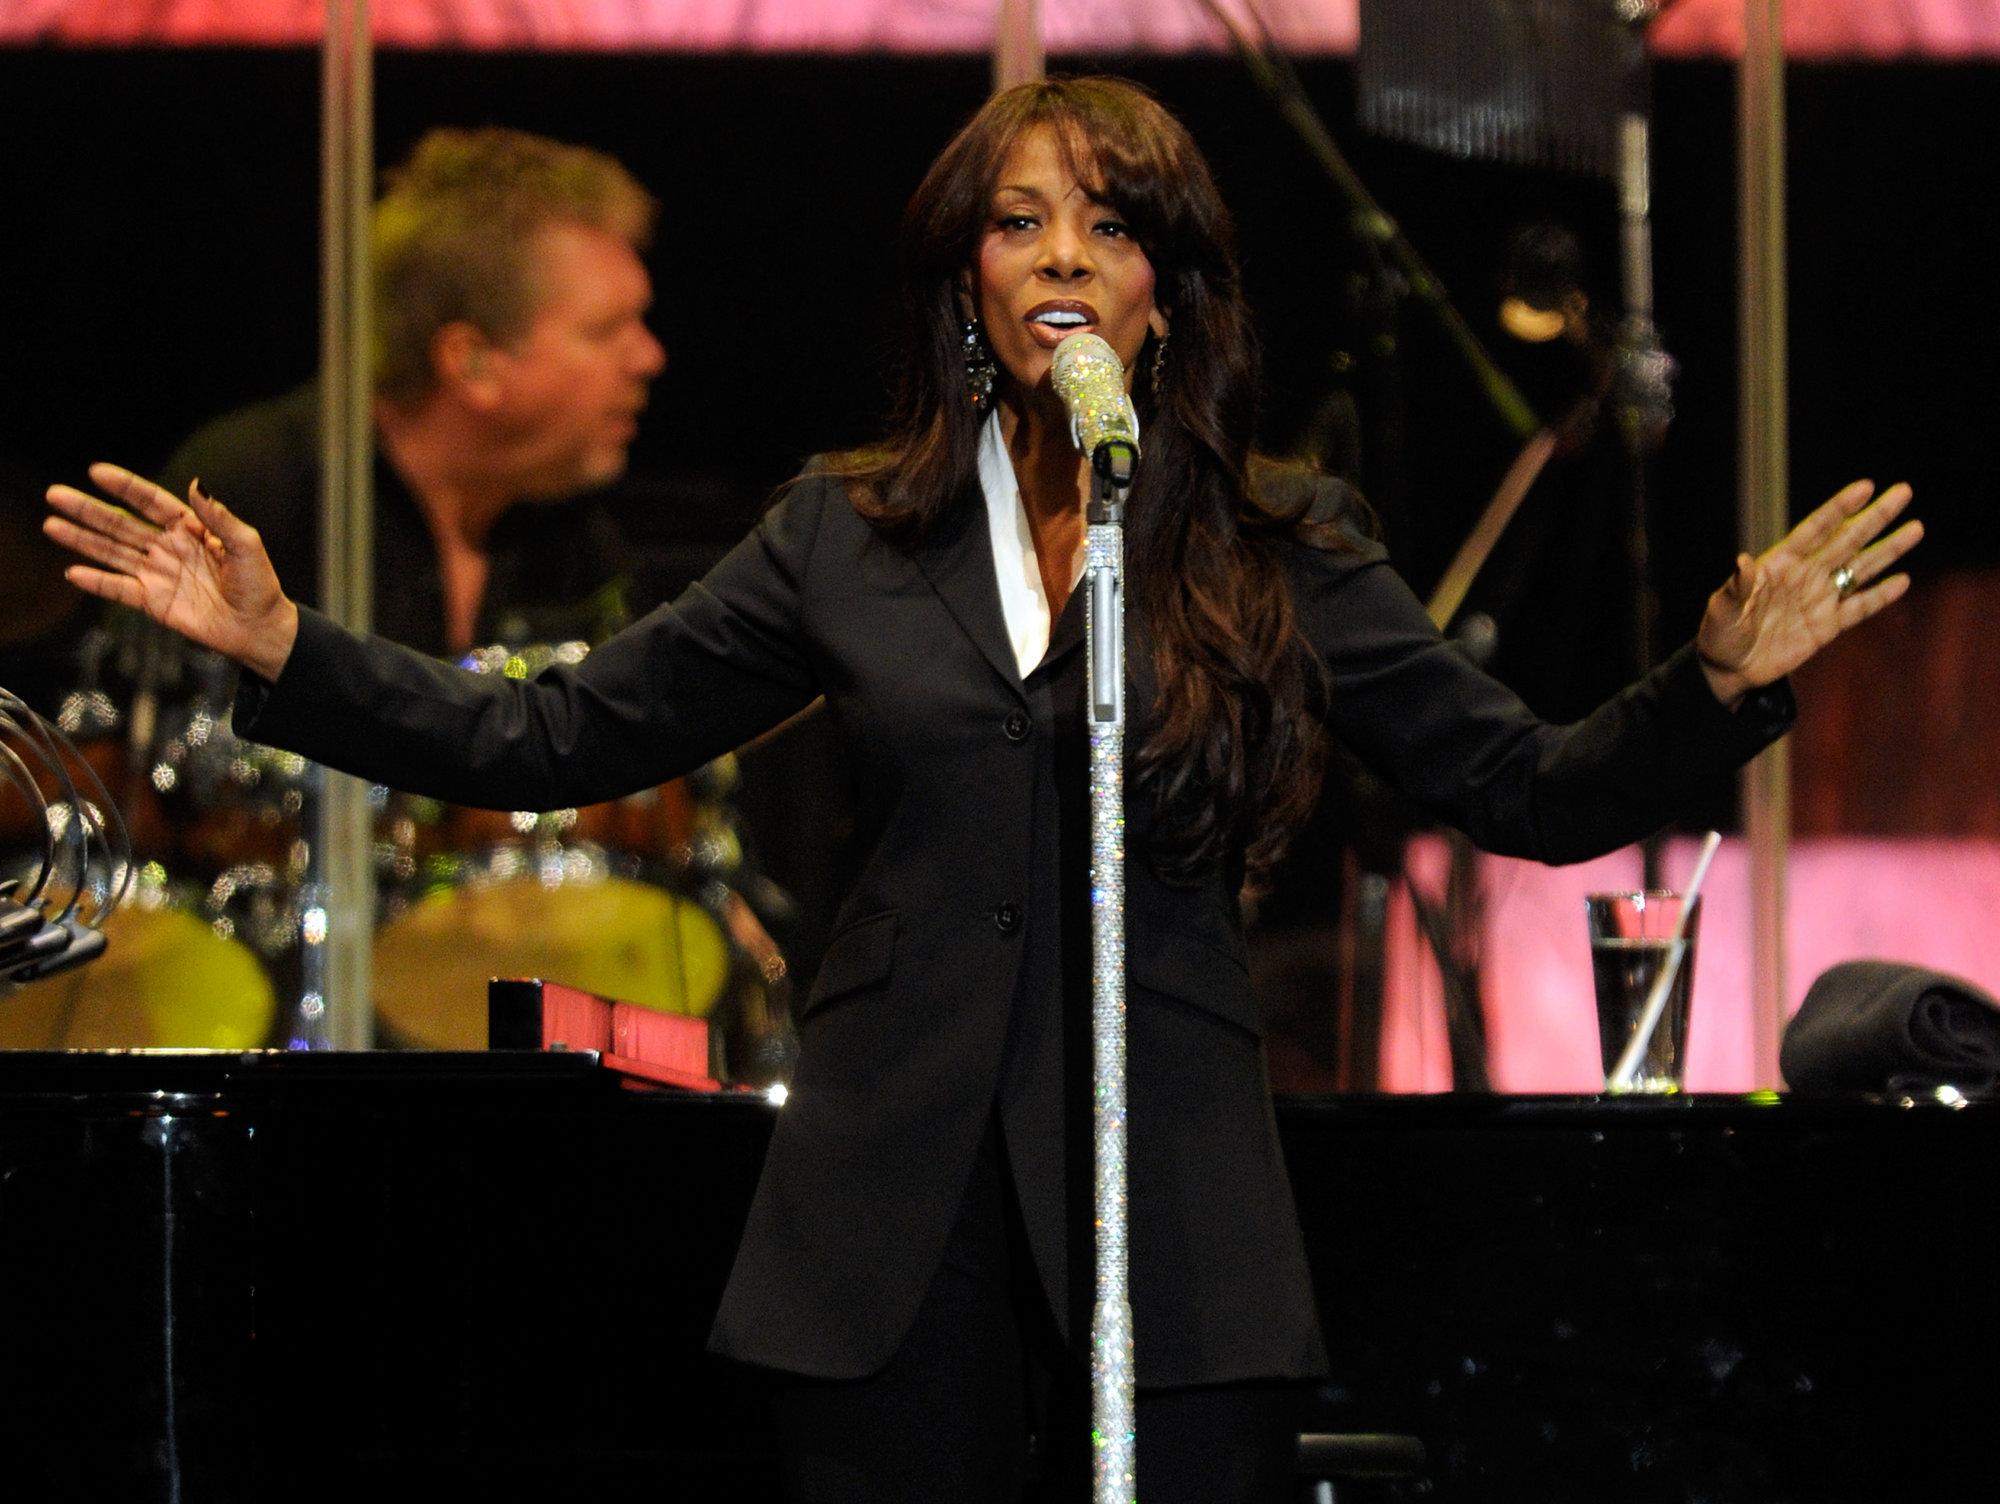 La reina de la música disco, Donna Summer, fallece víctima de un cáncer